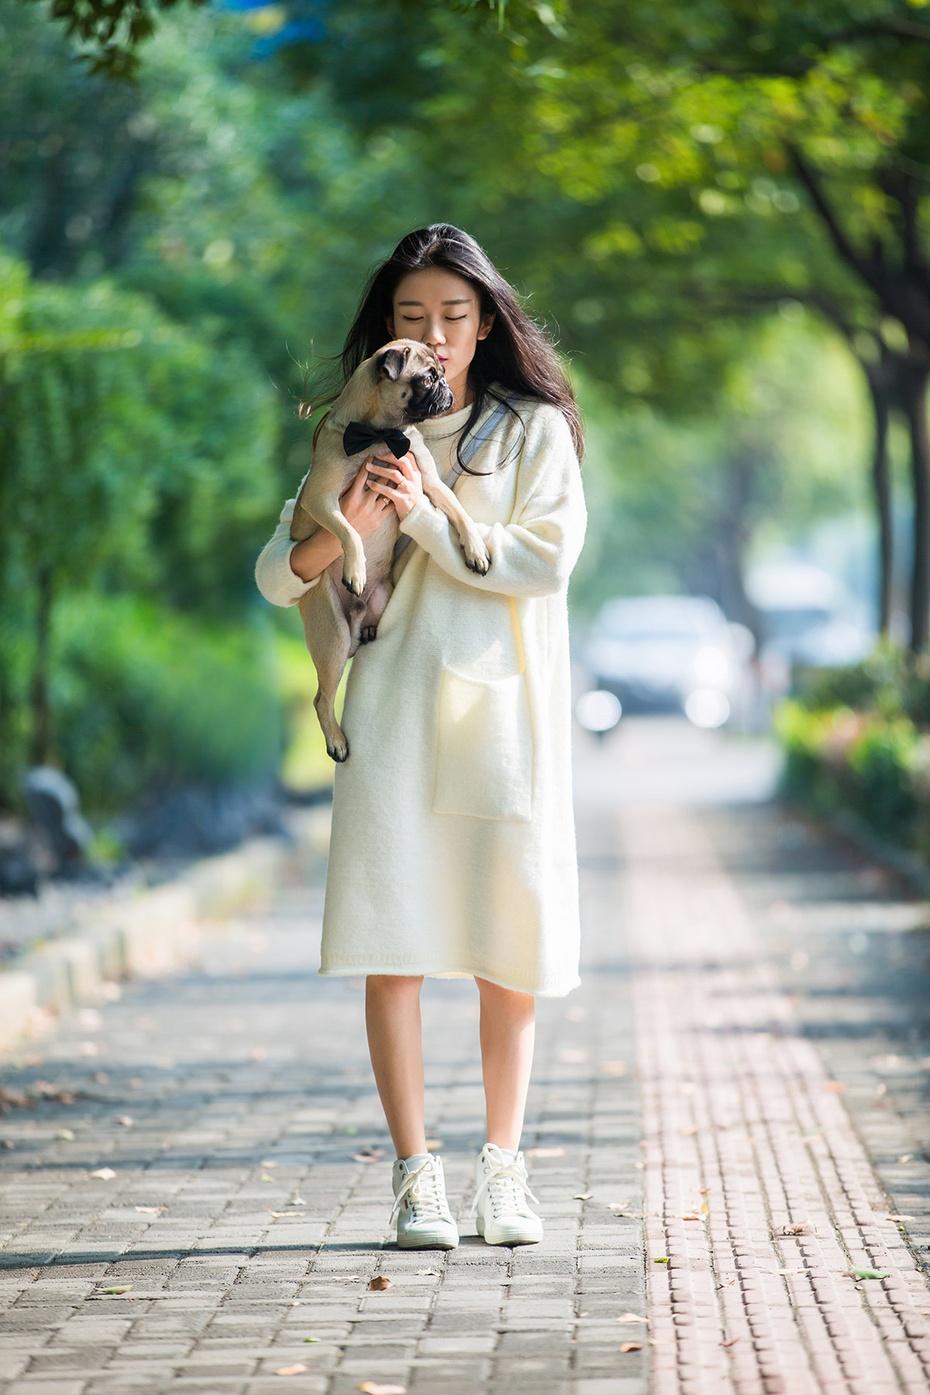 [Ava搭配日记]纯白日记 - AvaFoo - Avas Fashion Blog